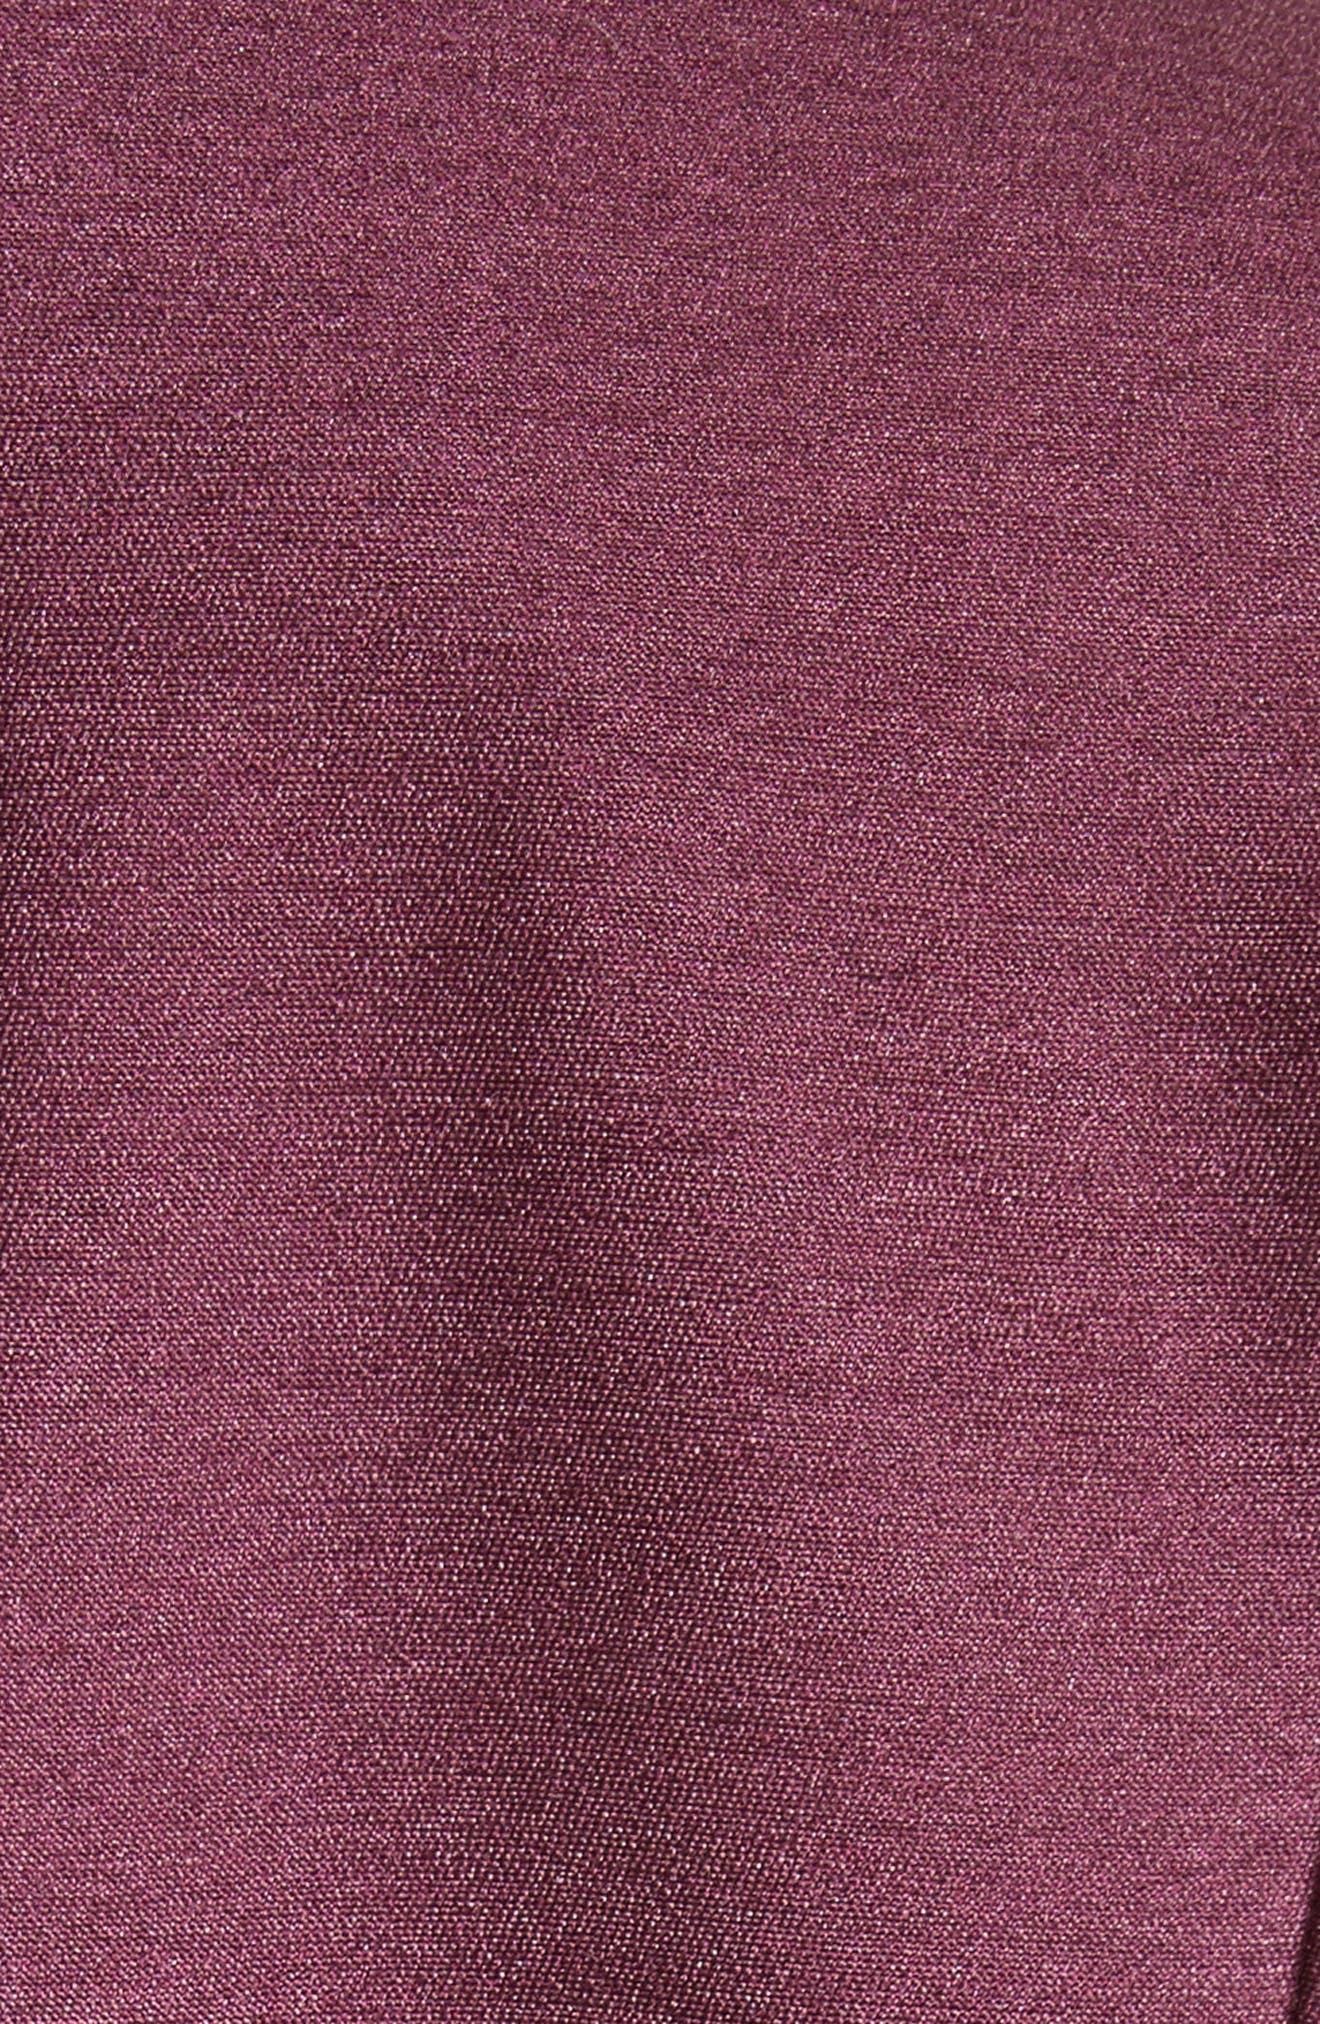 Narika Wool & Silk Jacket,                             Alternate thumbnail 6, color,                             Plum